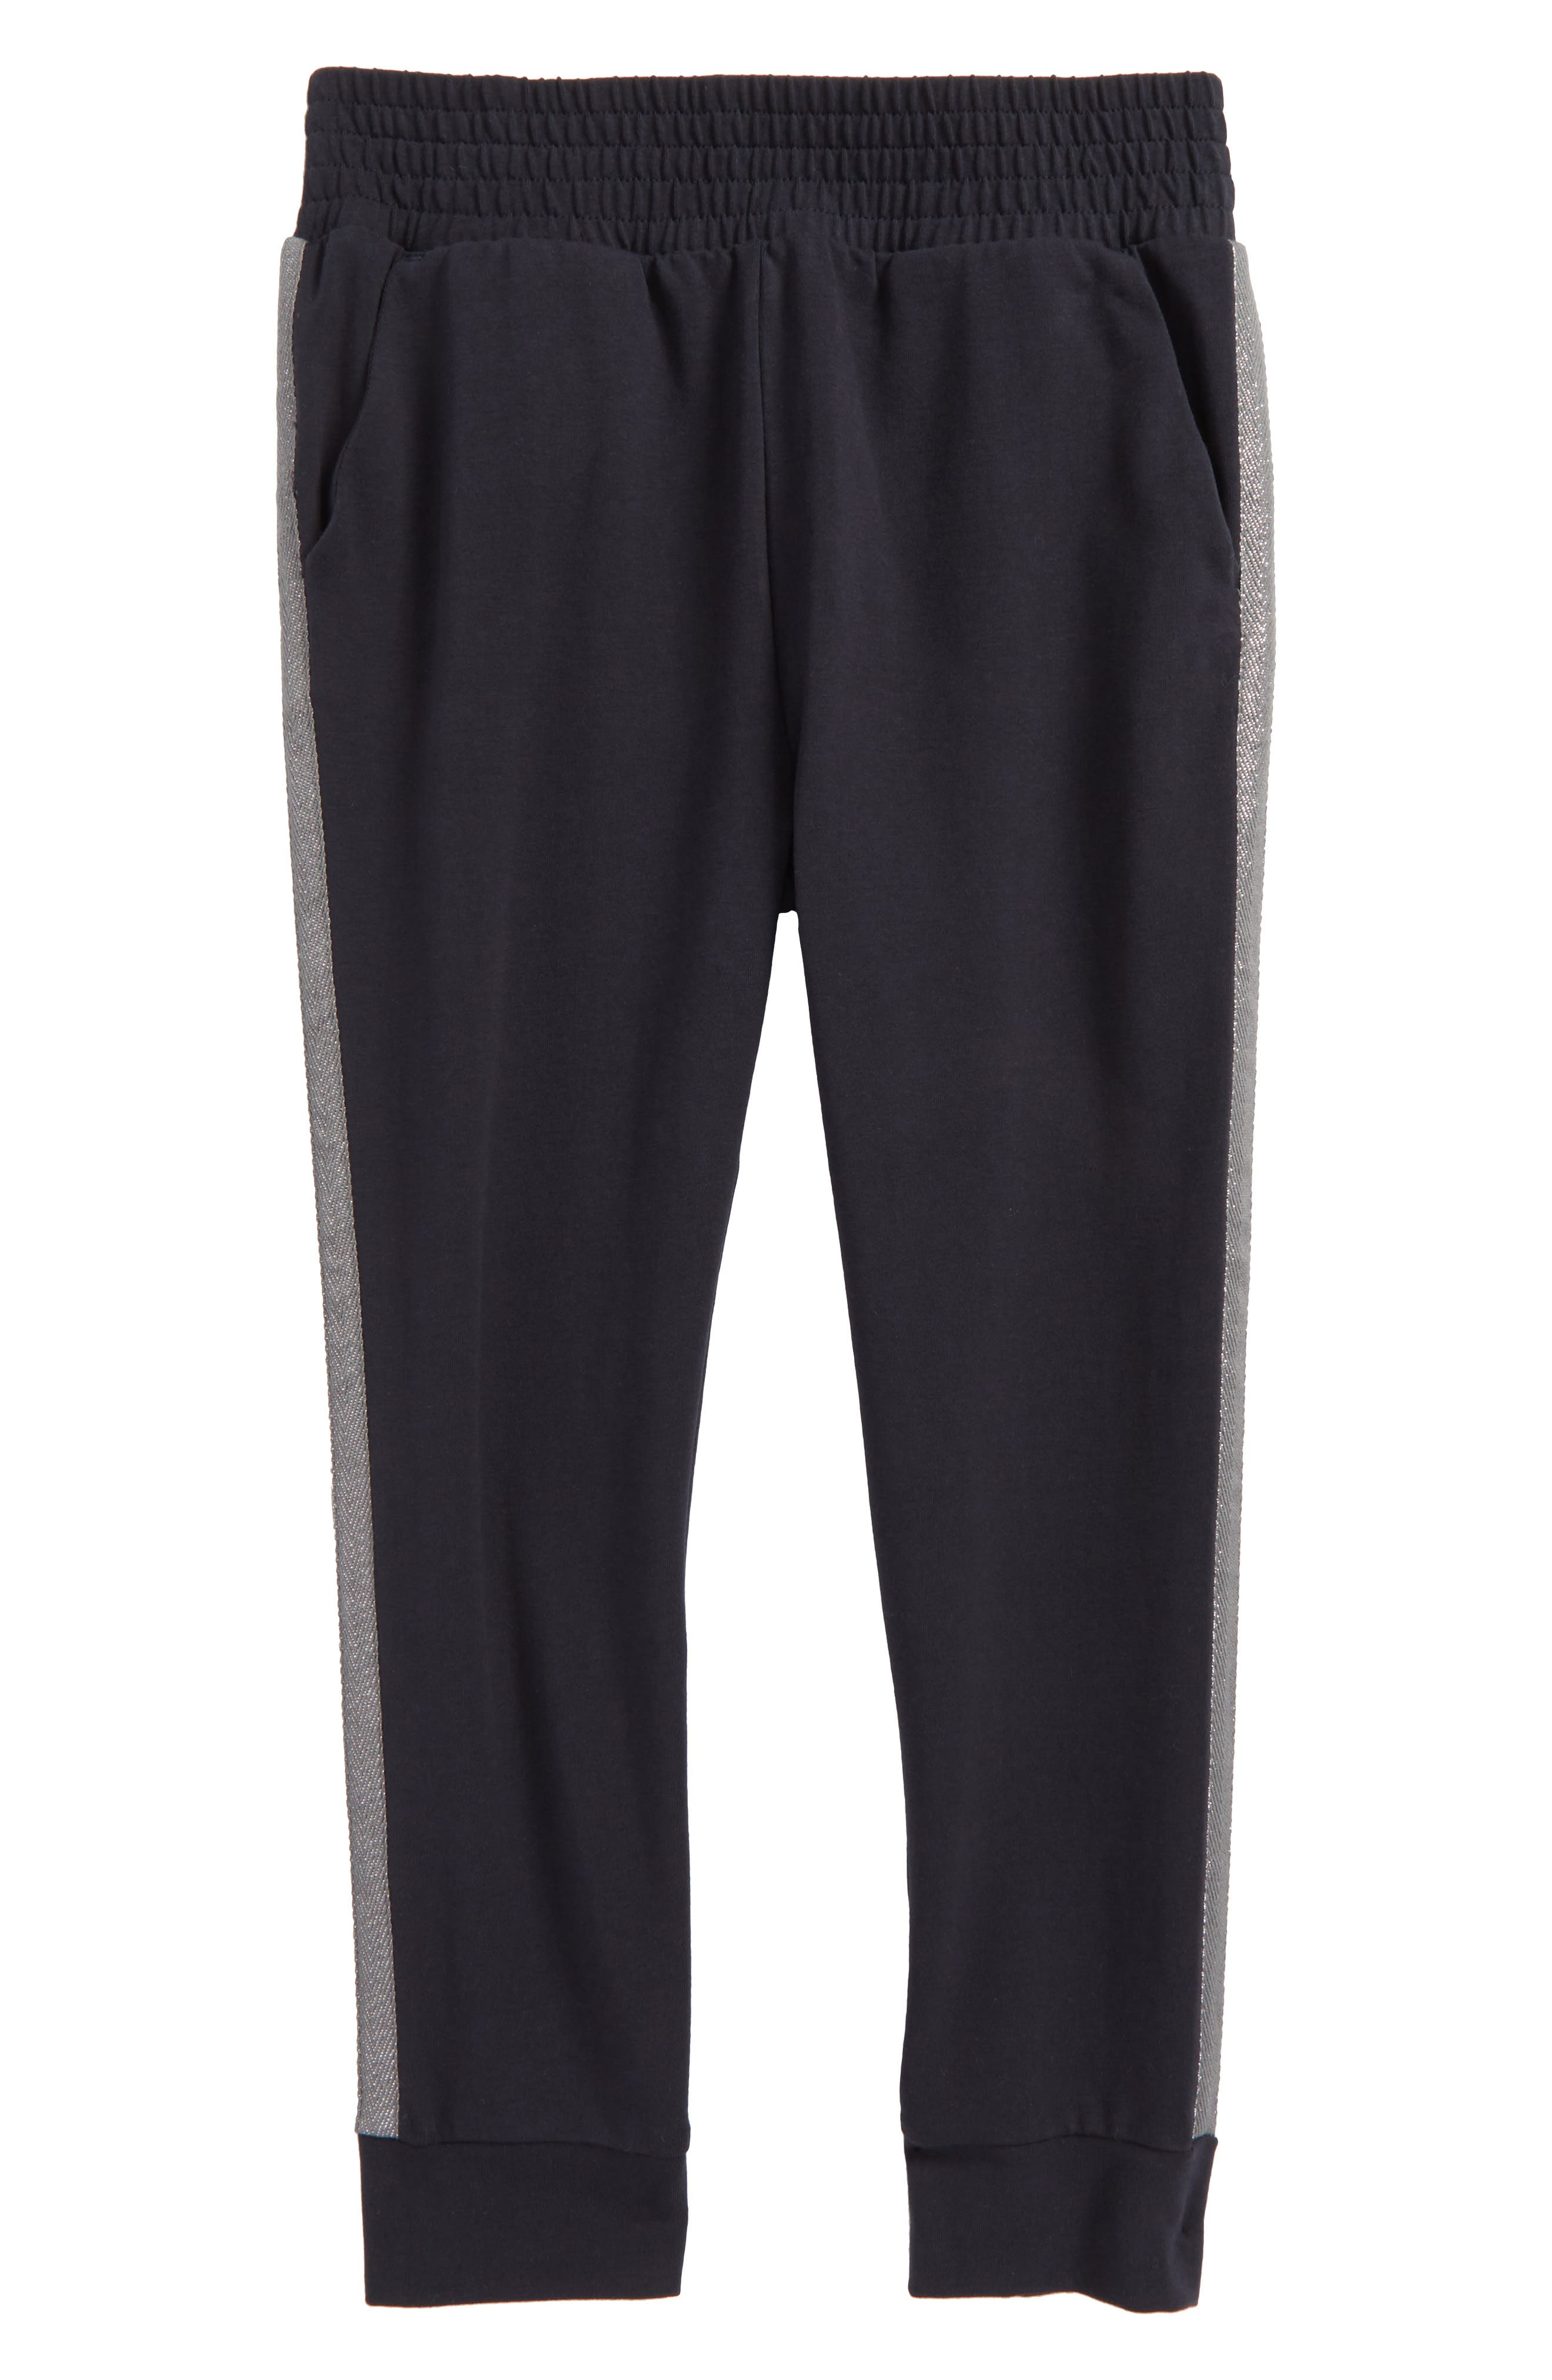 Main Image - Tea Collection Tuxedo Stripe Jogger Pants (Toddler Girls, Little Girls & Big Girls)